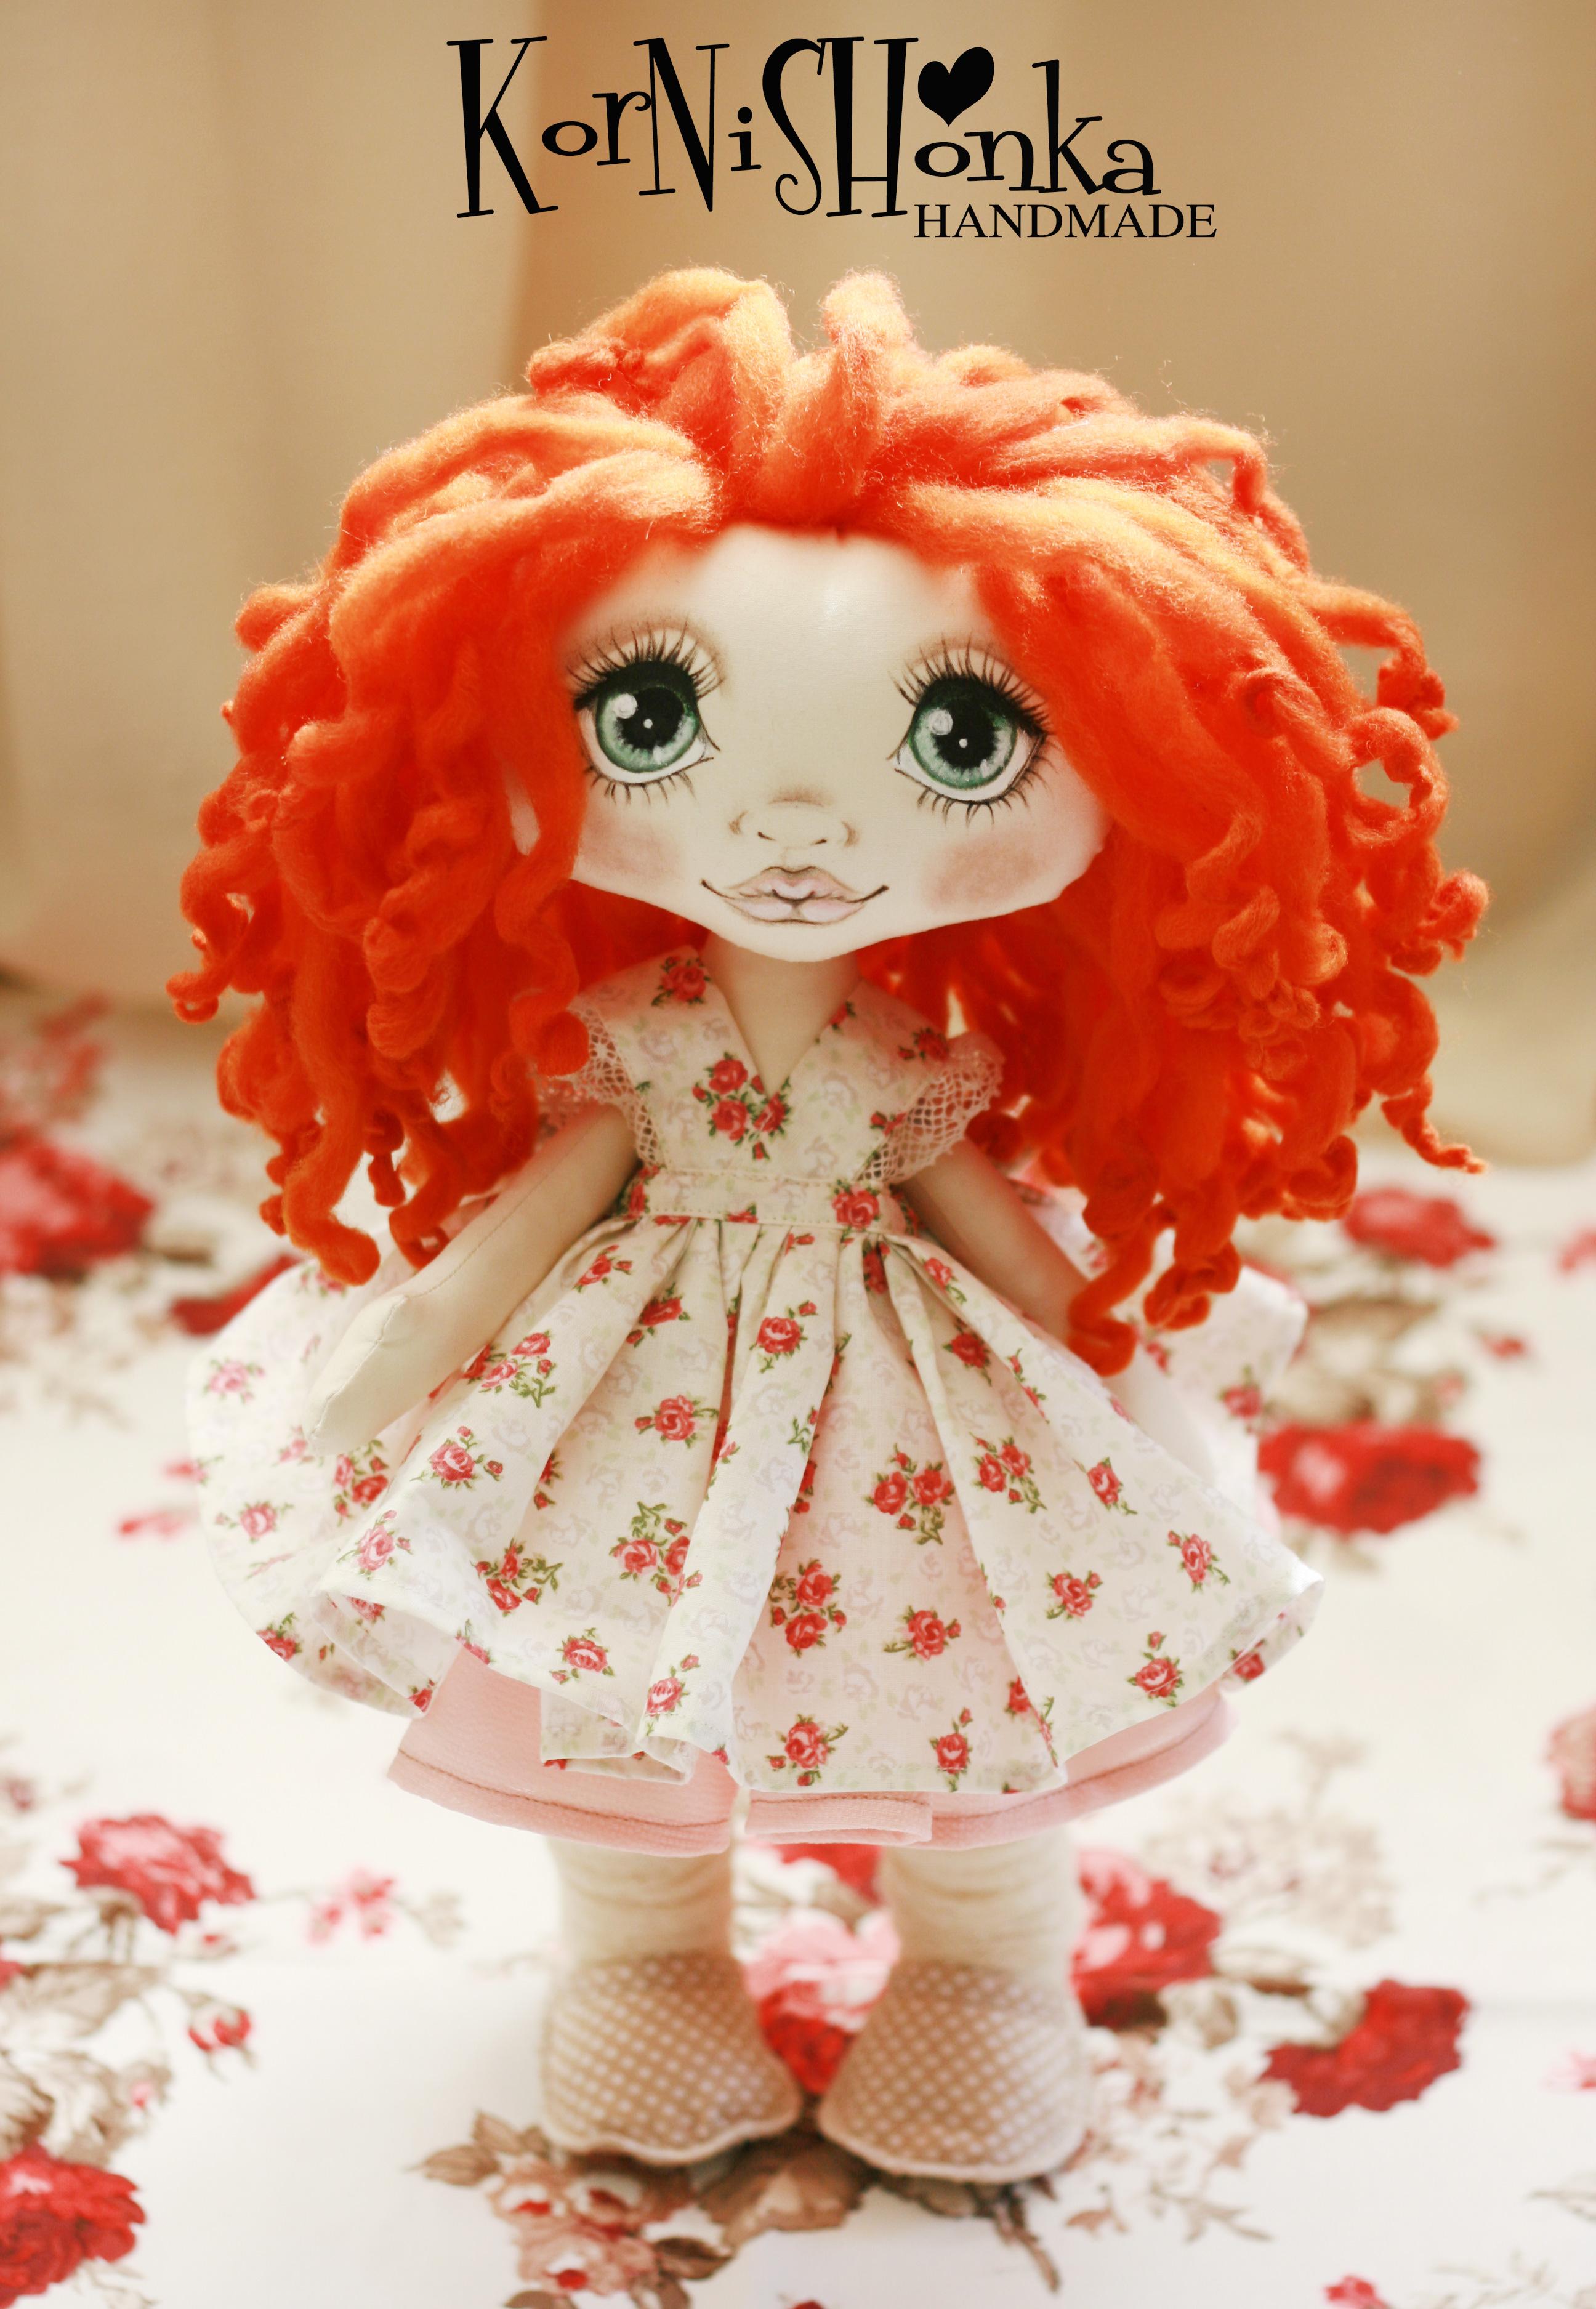 handmade dolls by korneliya haralanova